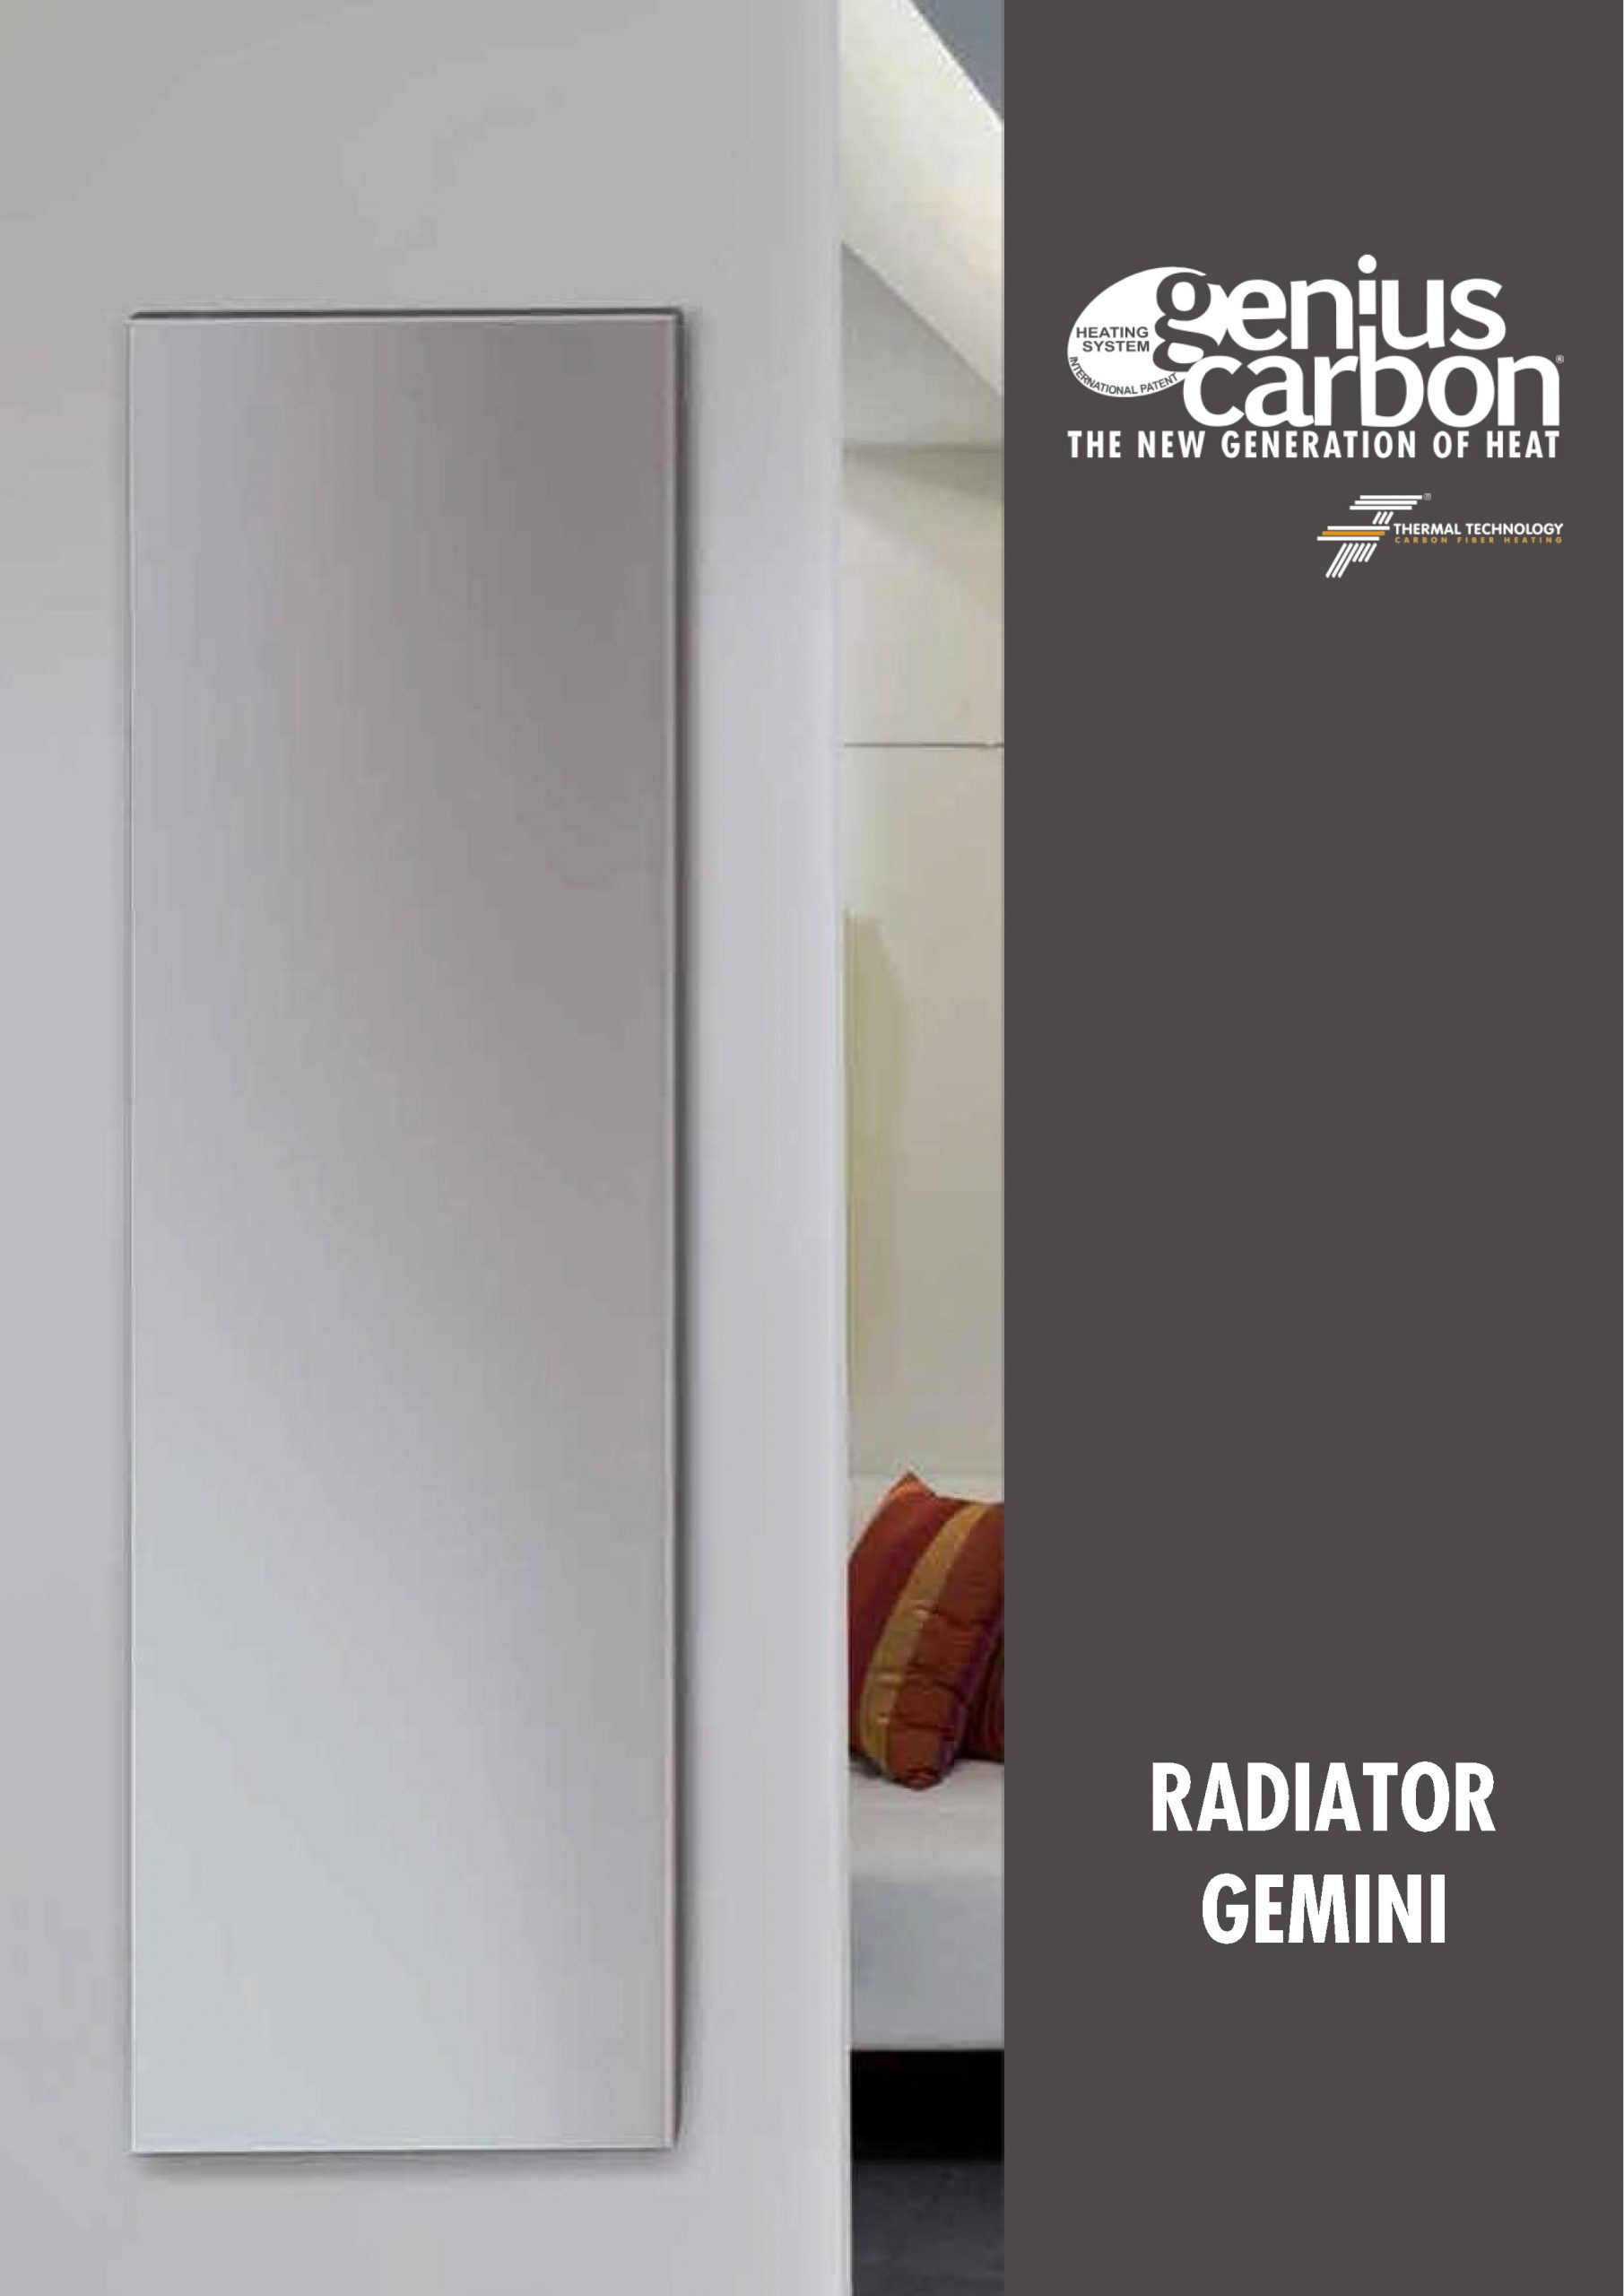 https://thermaltechnology.ro/wp-content/uploads/2020/03/RADIATOR-GEMINI_RD05_RO_Page_1-scaled.jpg